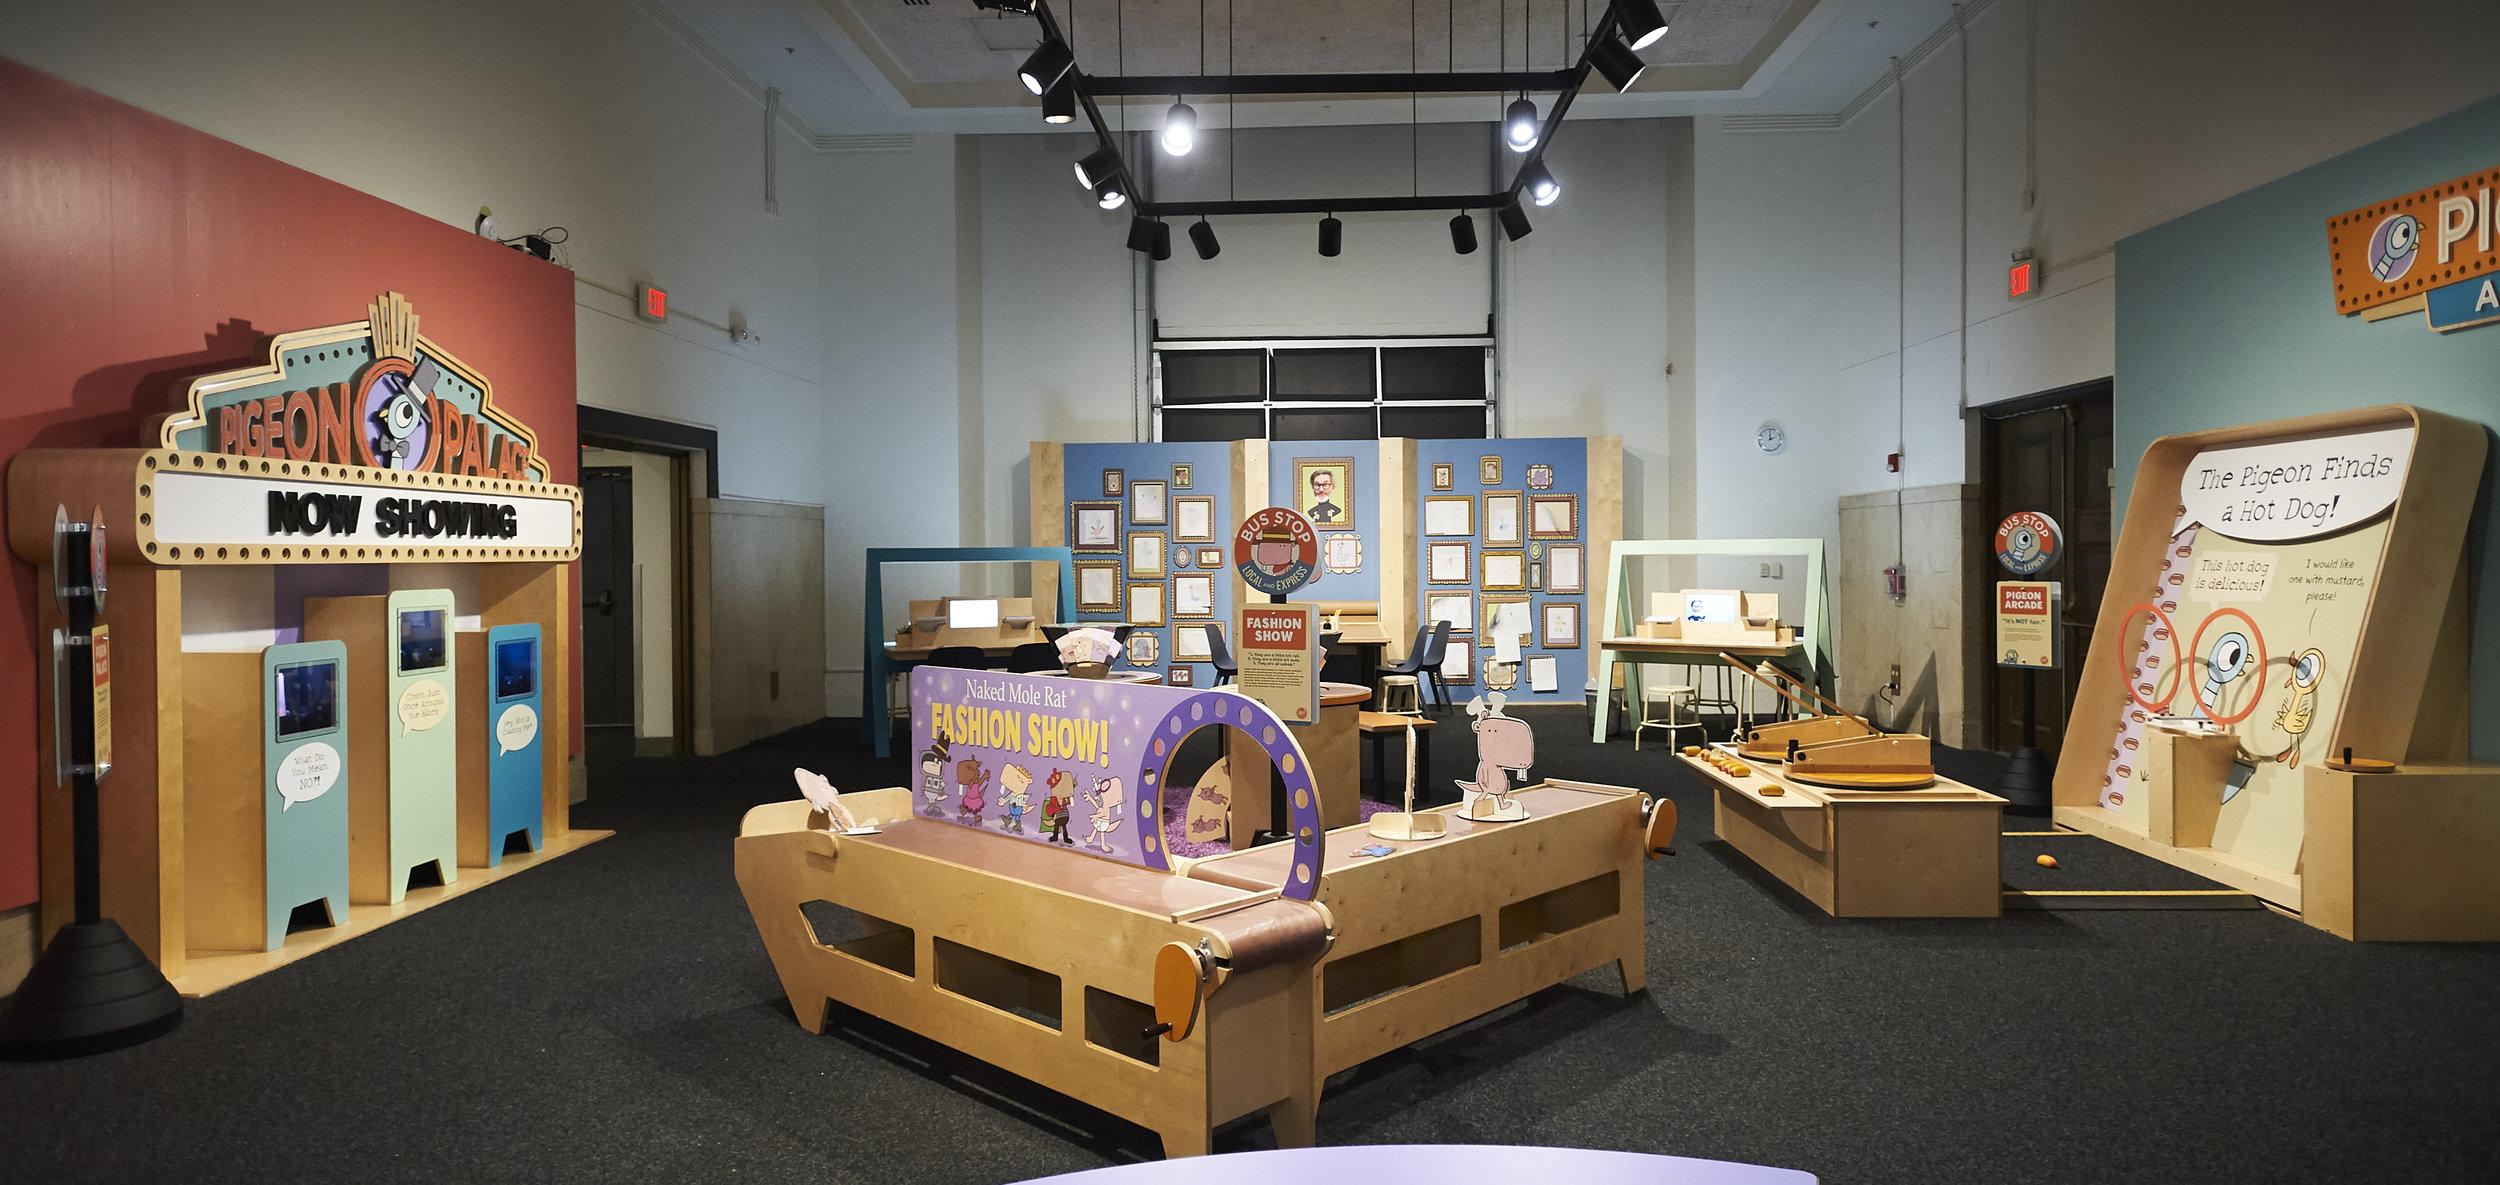 180425_ChildrensMuseum_Pigeon_262.jpg